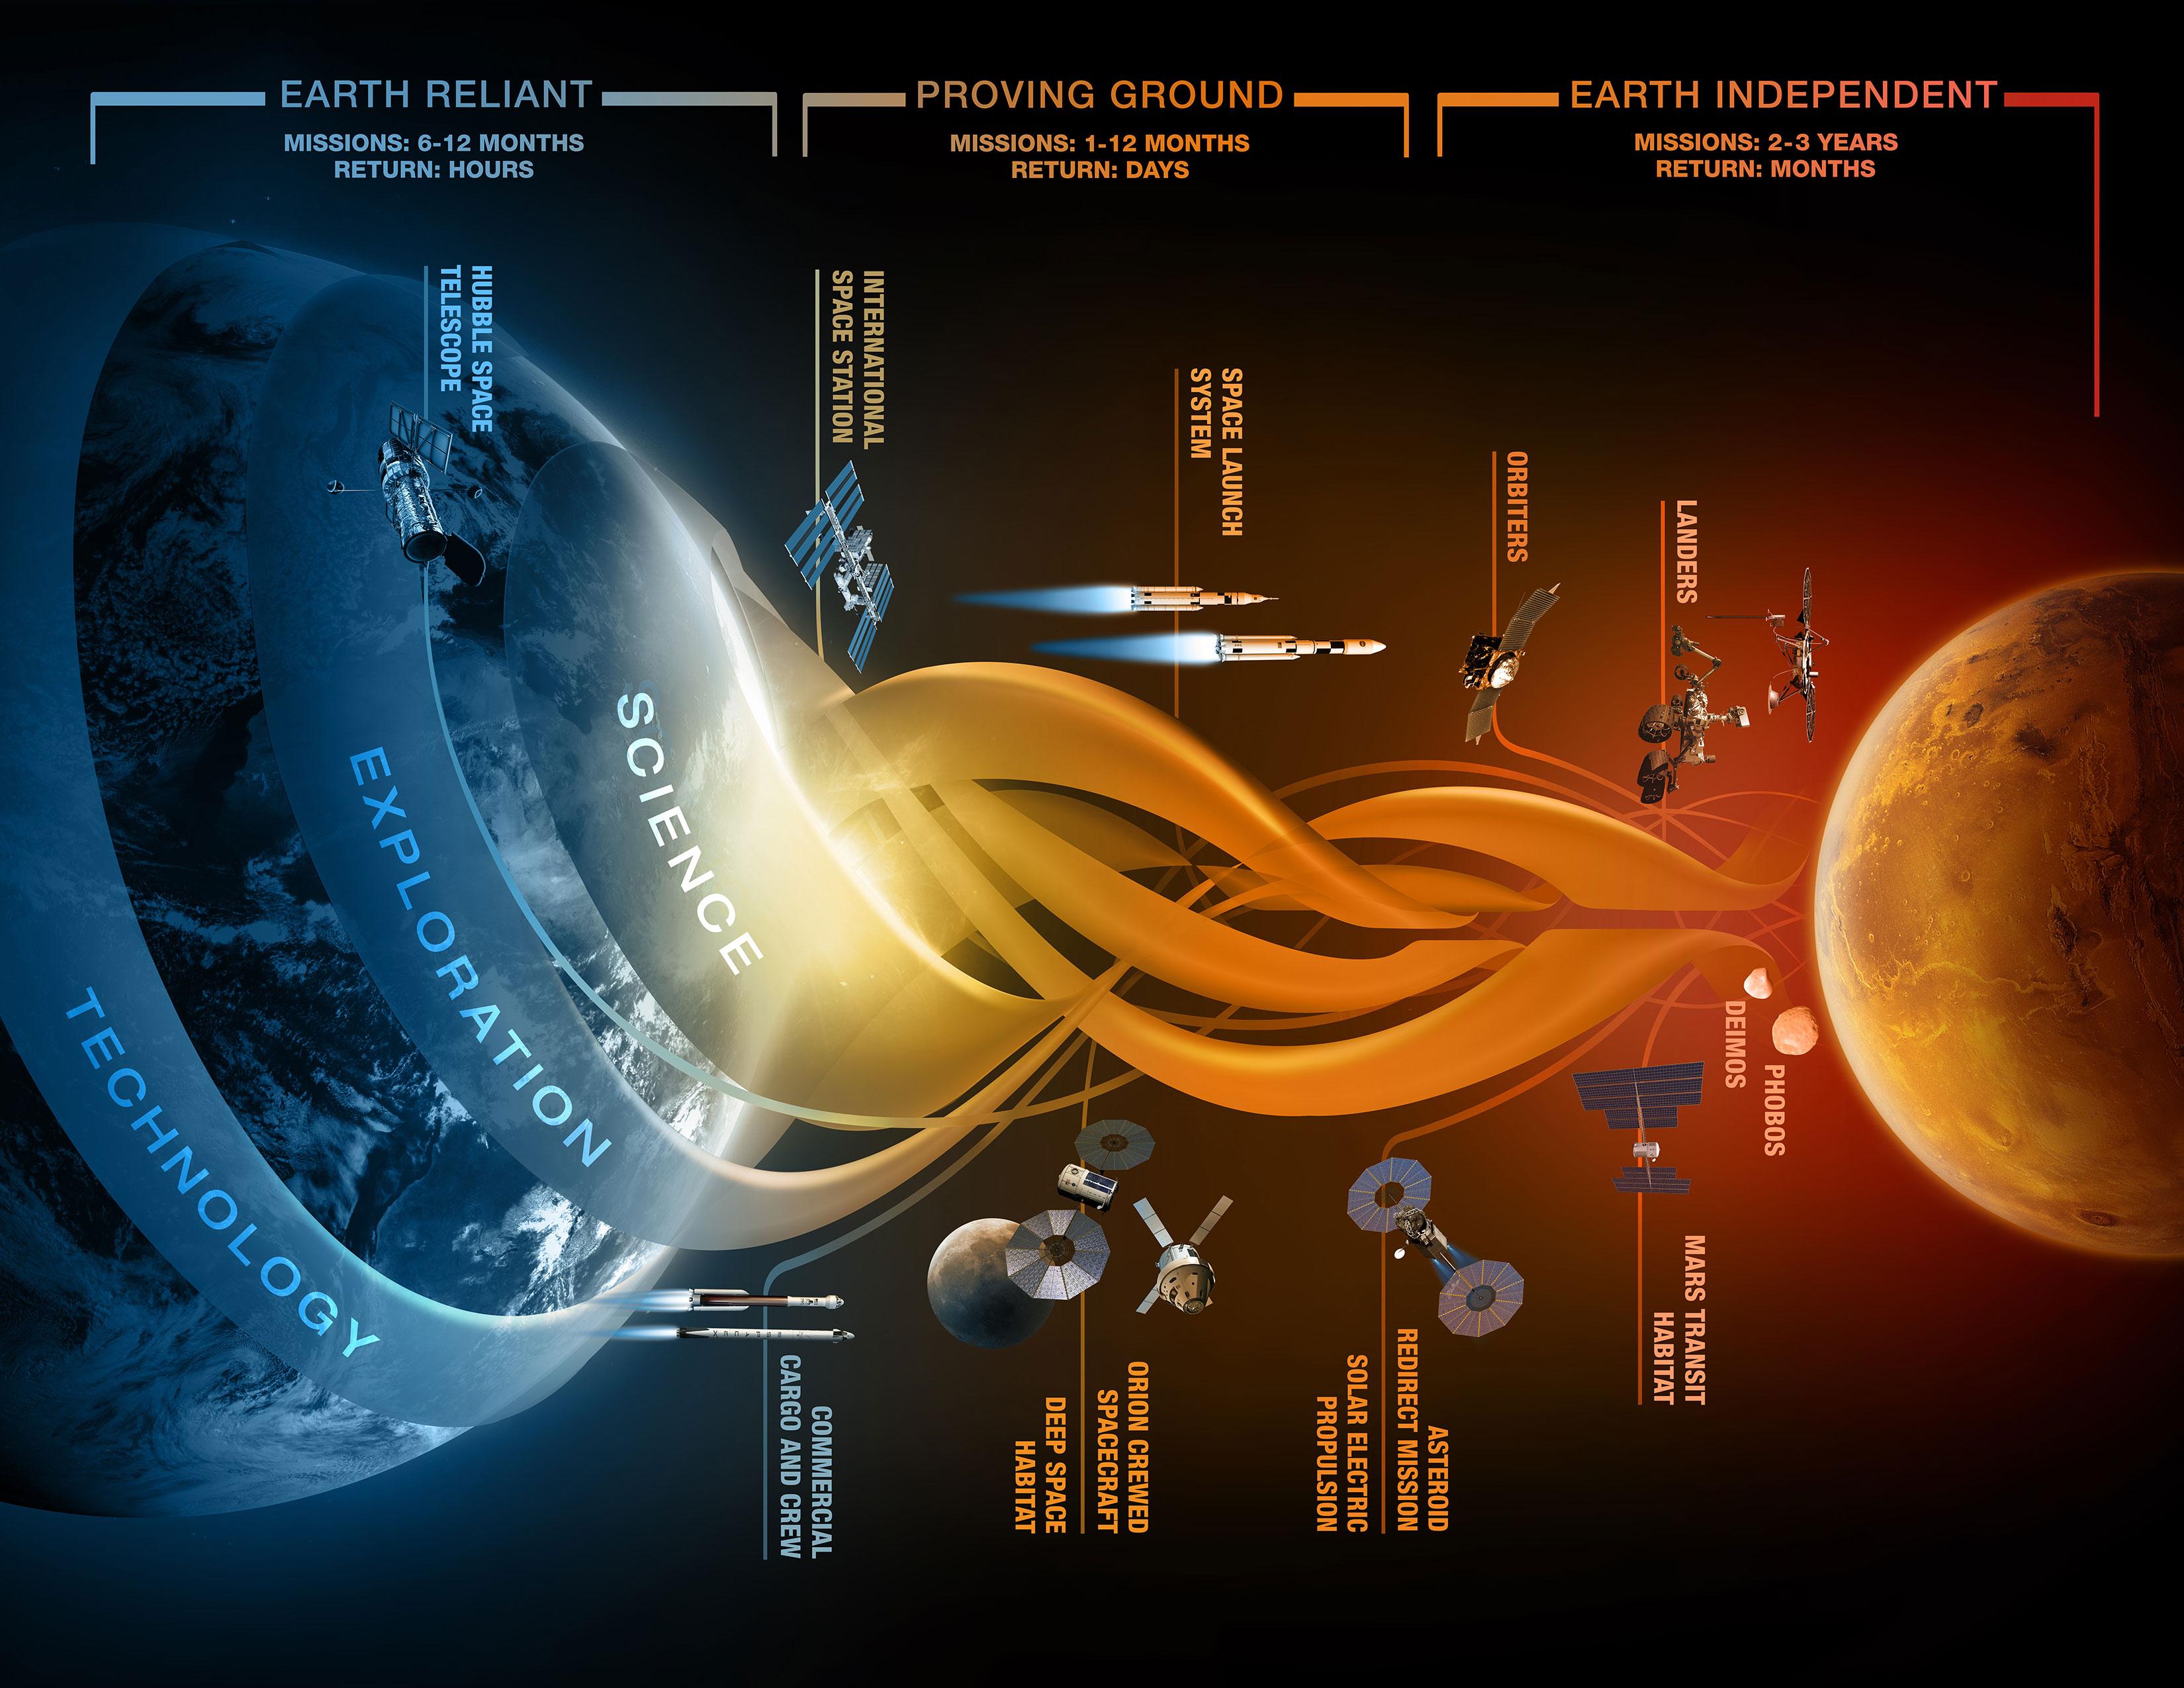 mars_mission_nasa